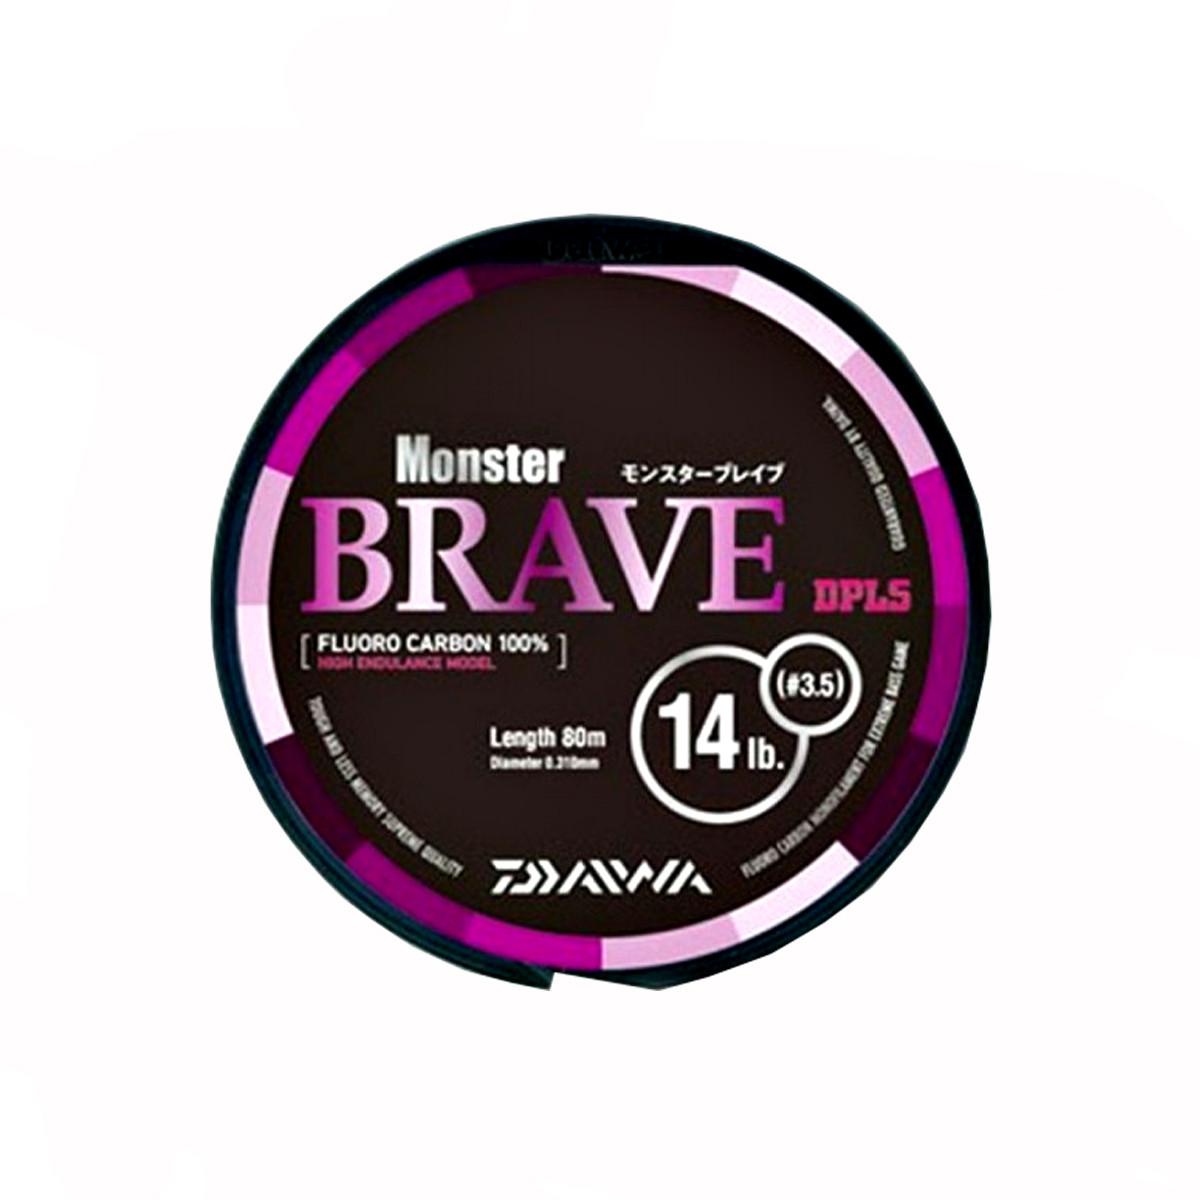 DAIWA MONSTER BRAVE 80M